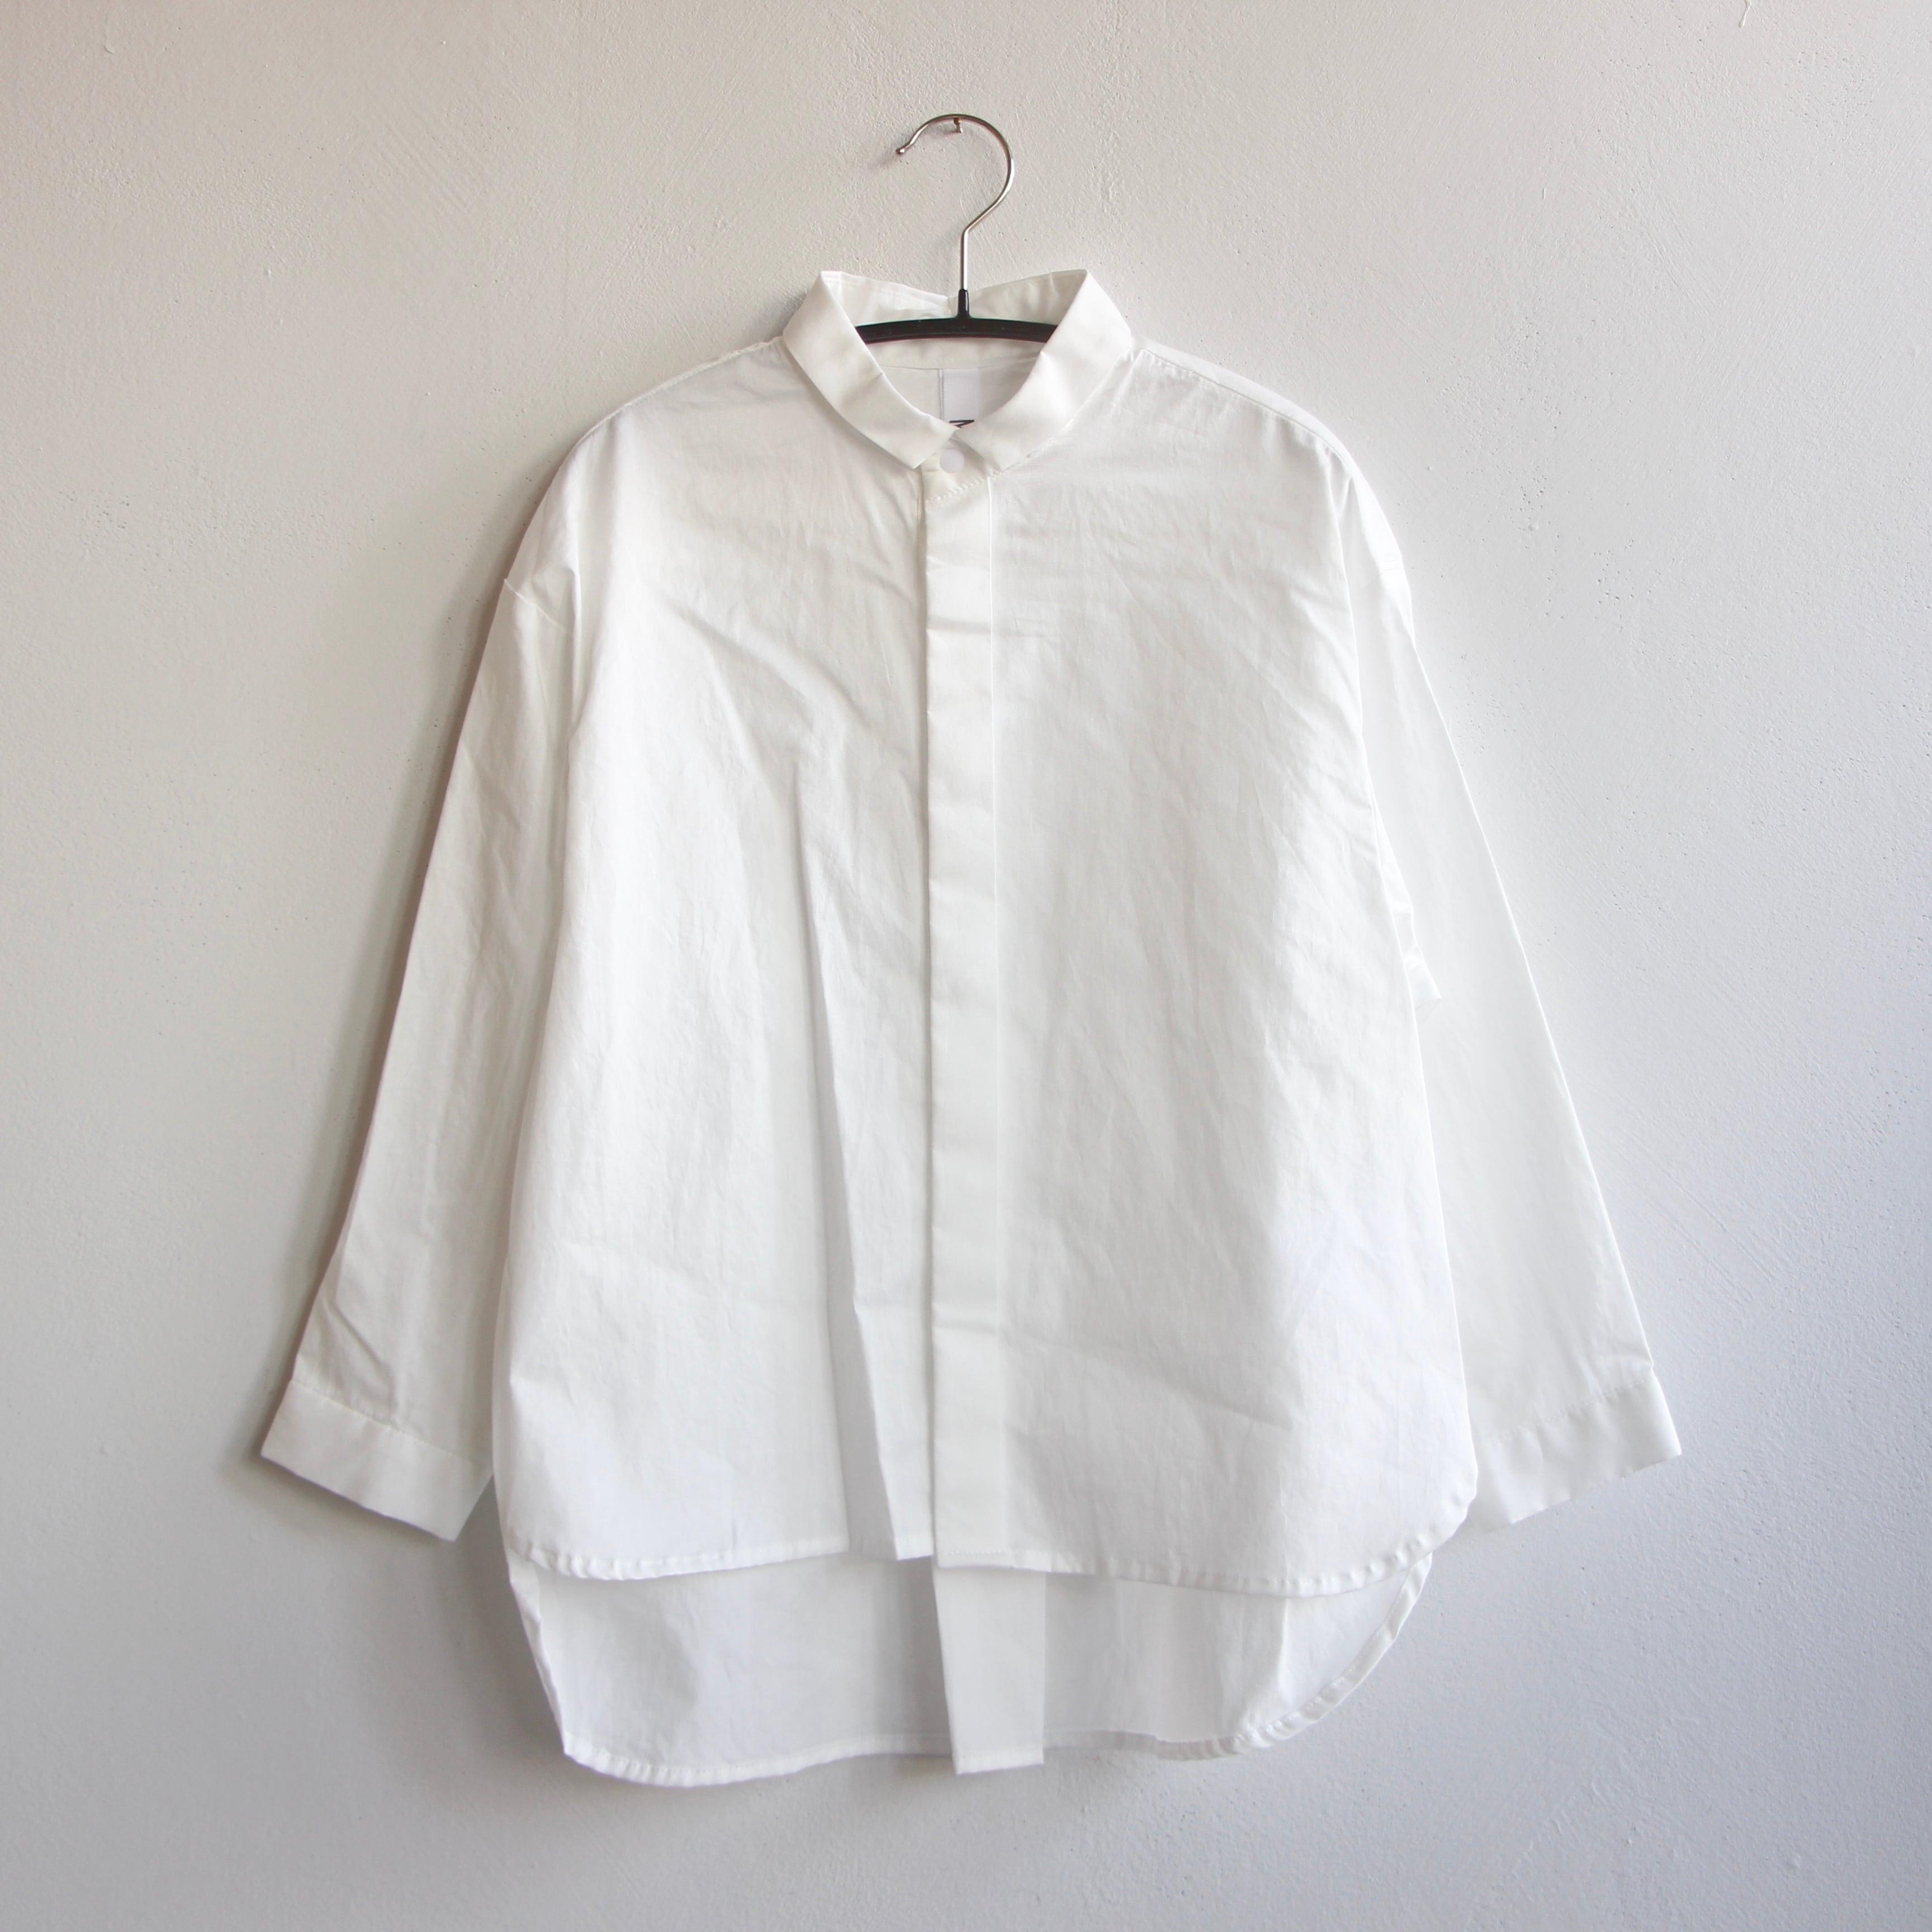 《MOUNTEN. 2021AW》80/1 washer big shirts / white